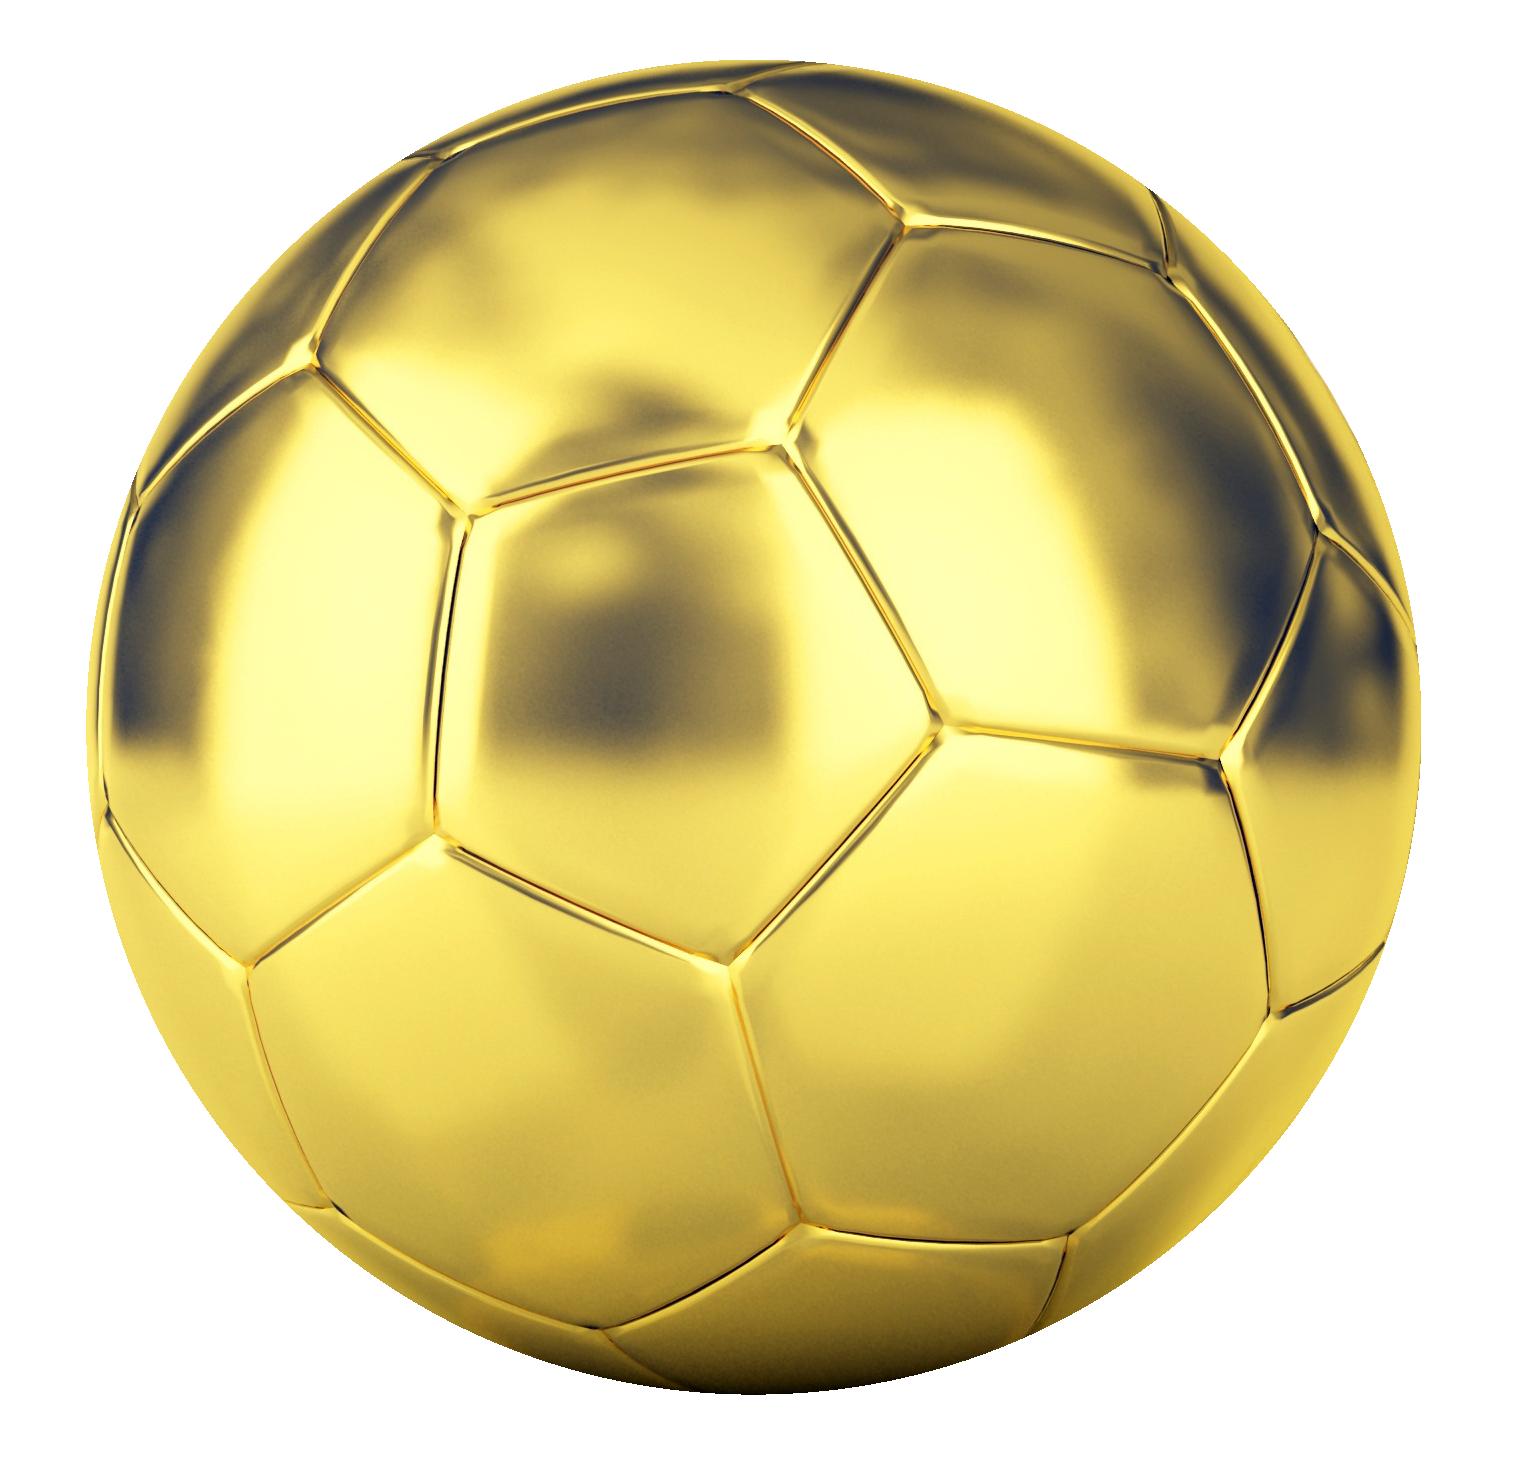 Golden Football PNG Transparent Image - Football PNG